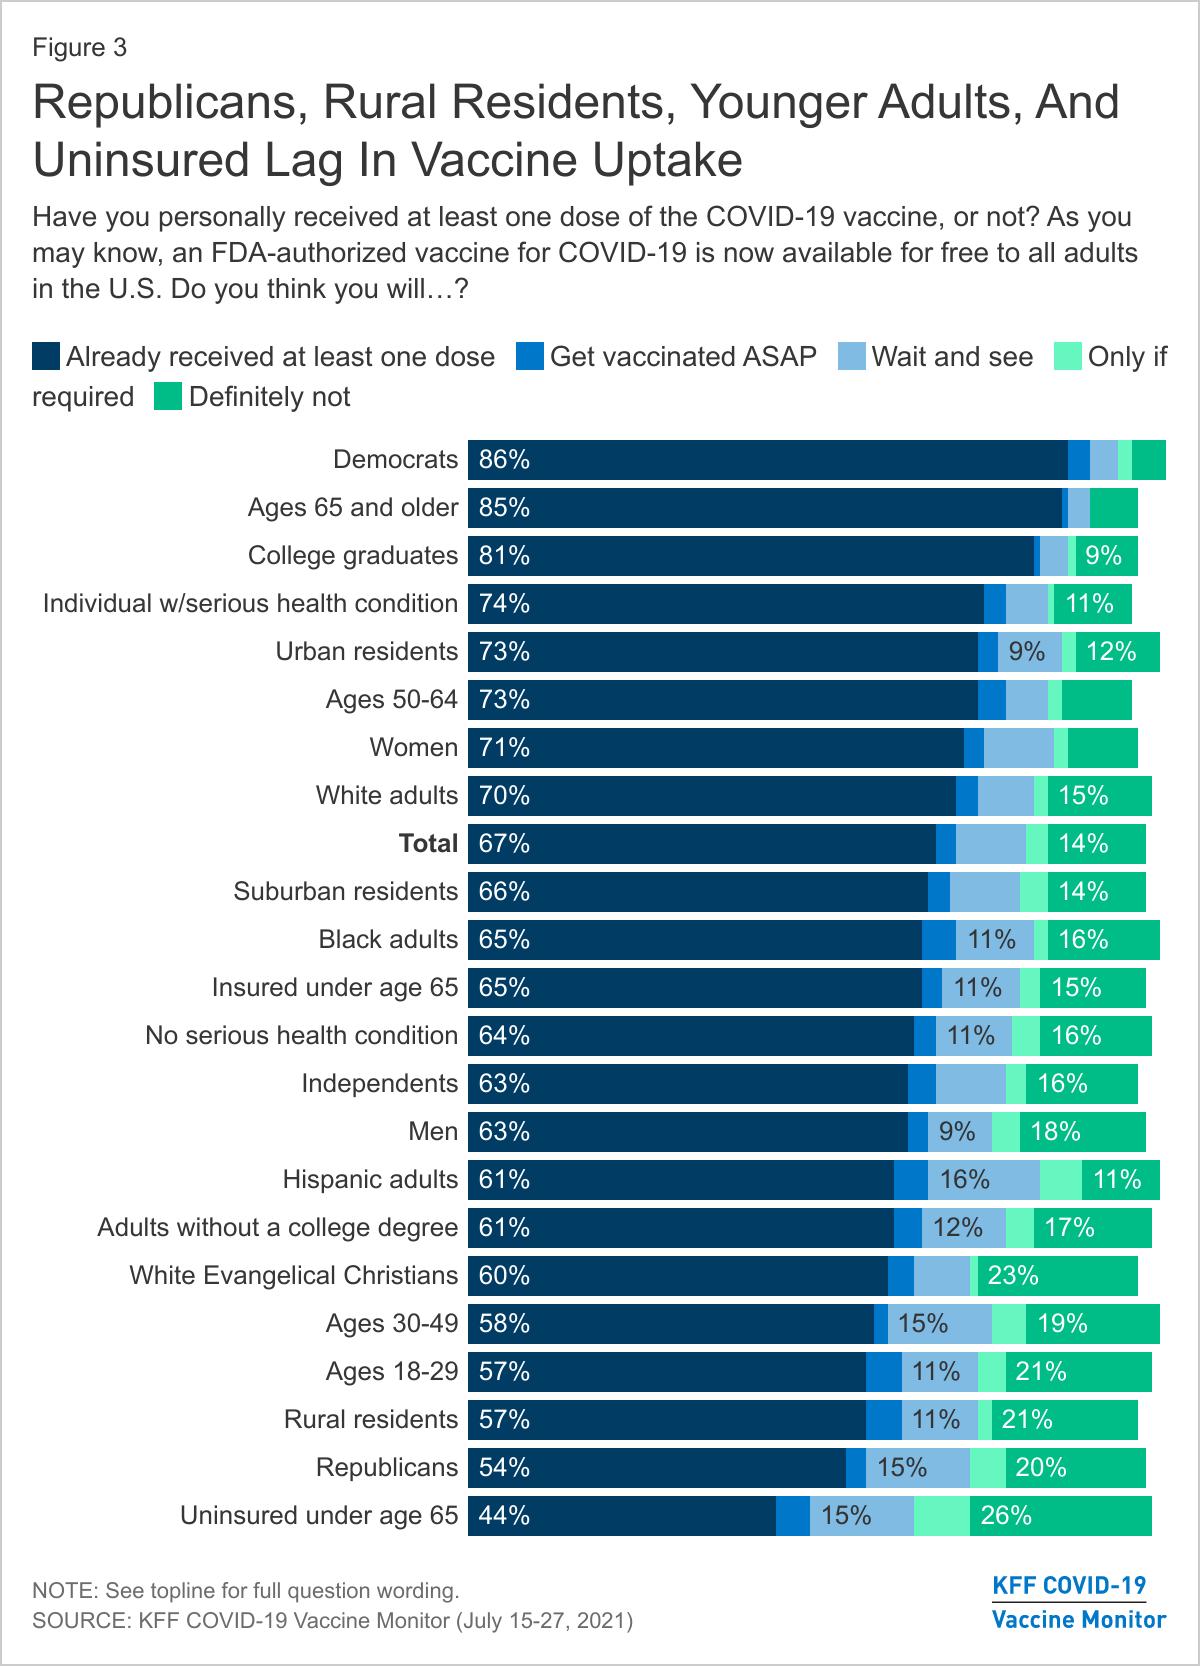 KFF chart- demographics that lag in vaccine uptake